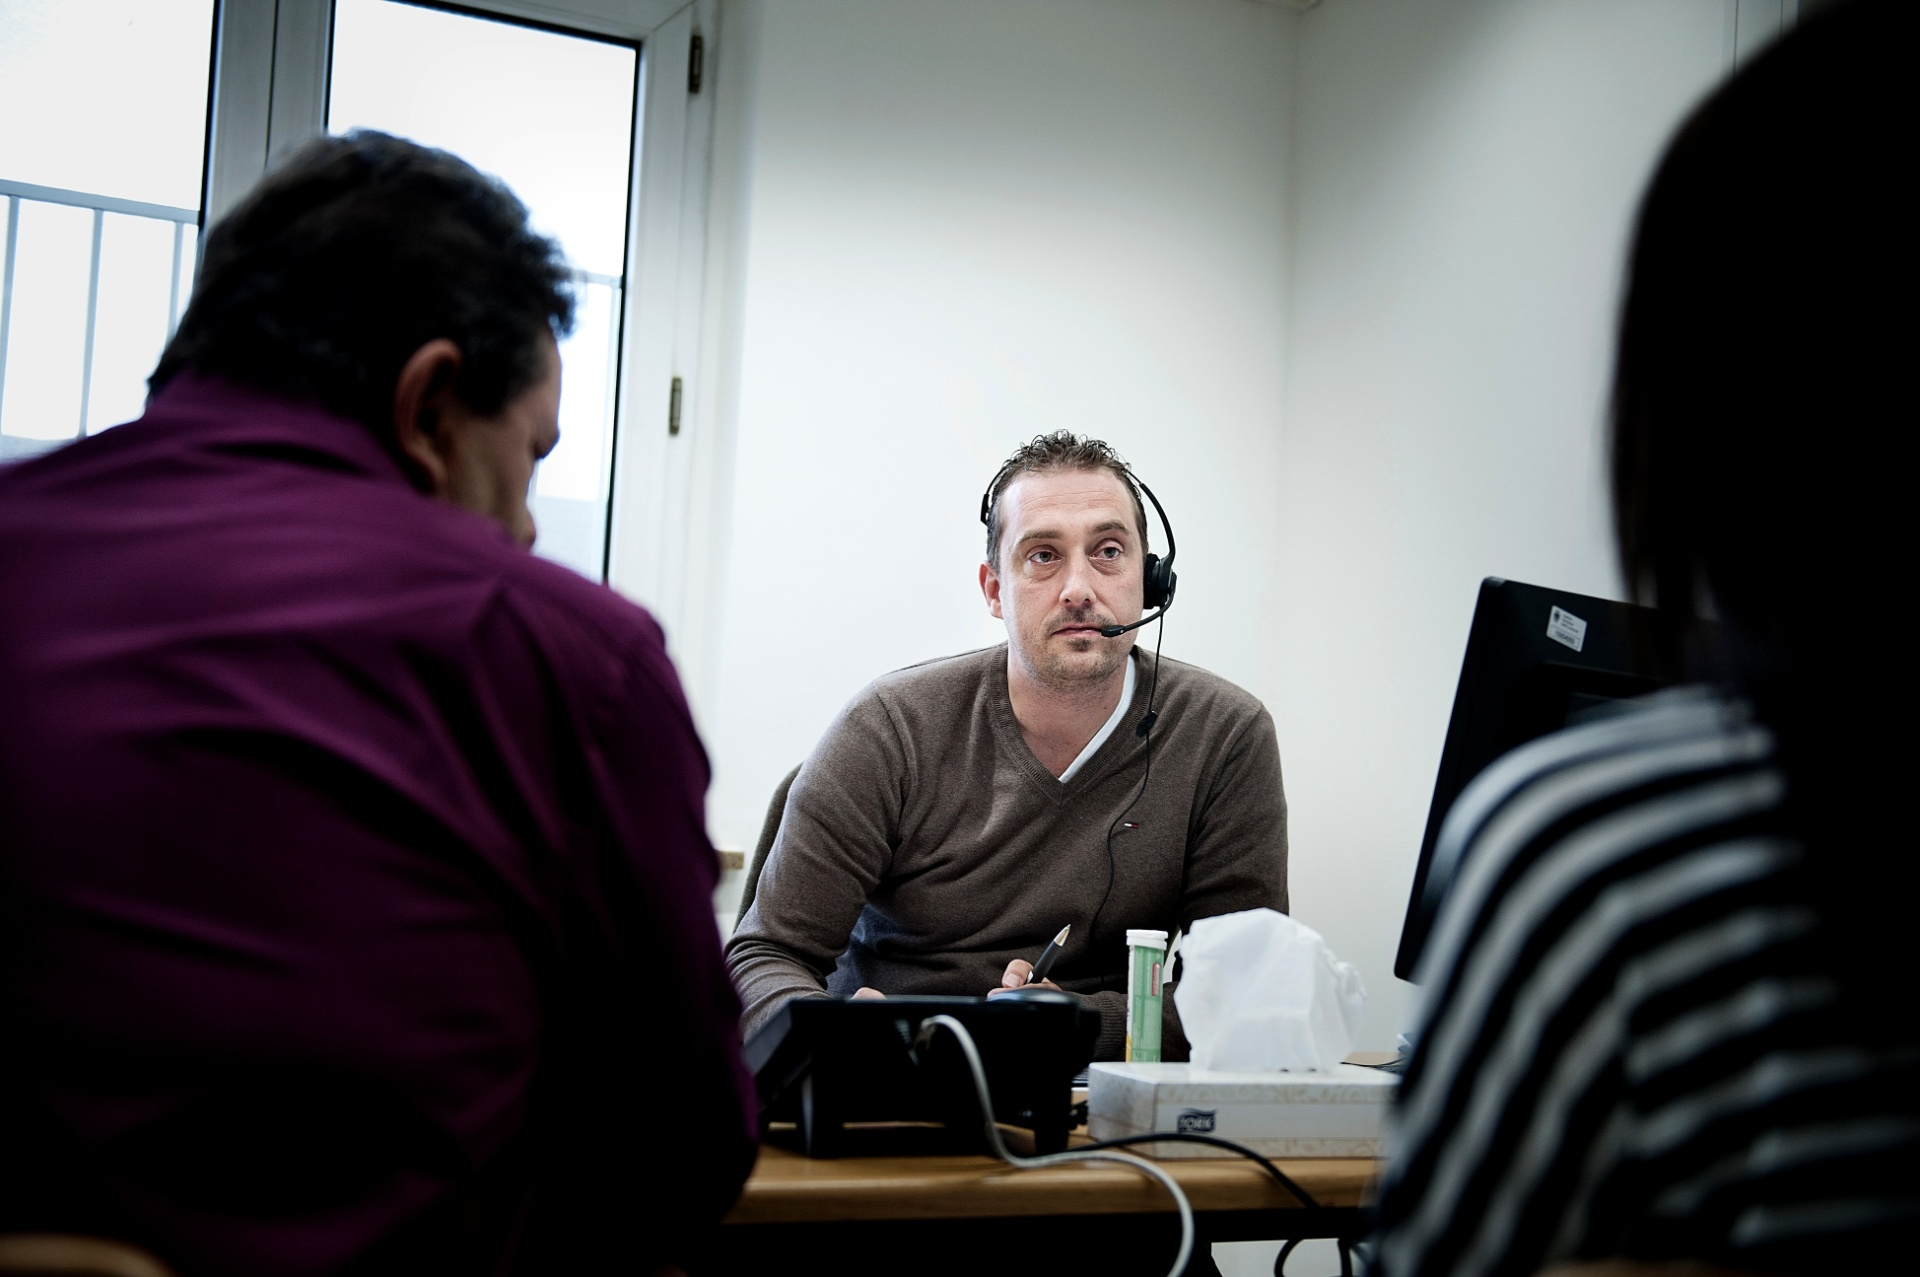 Entrevista de asilo na Alemanha